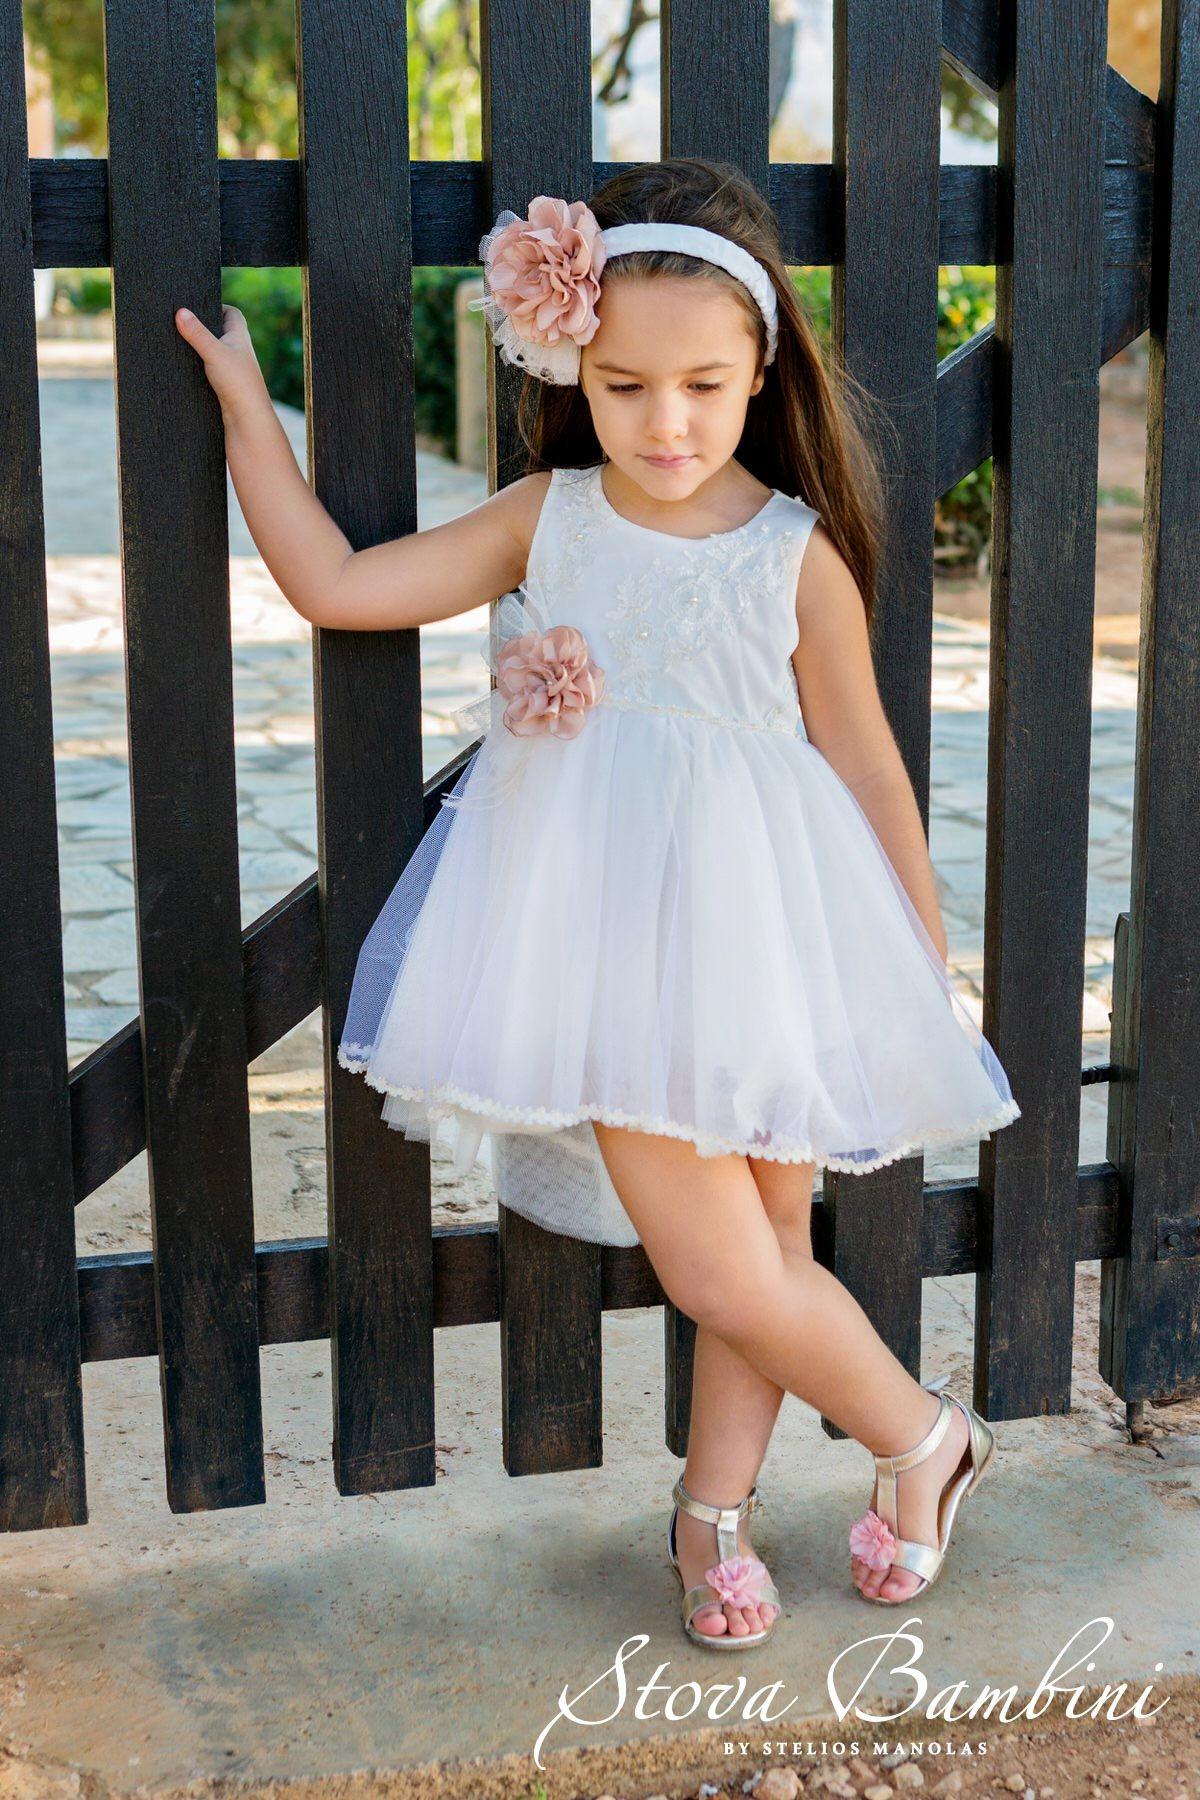 de9203dd38c ΒΑΠΤΙΣΤΙΚΟ ΡΟΥΧΟ STOVA BAMBINI   STOVA BAMBINI   Flower girl dresses ...